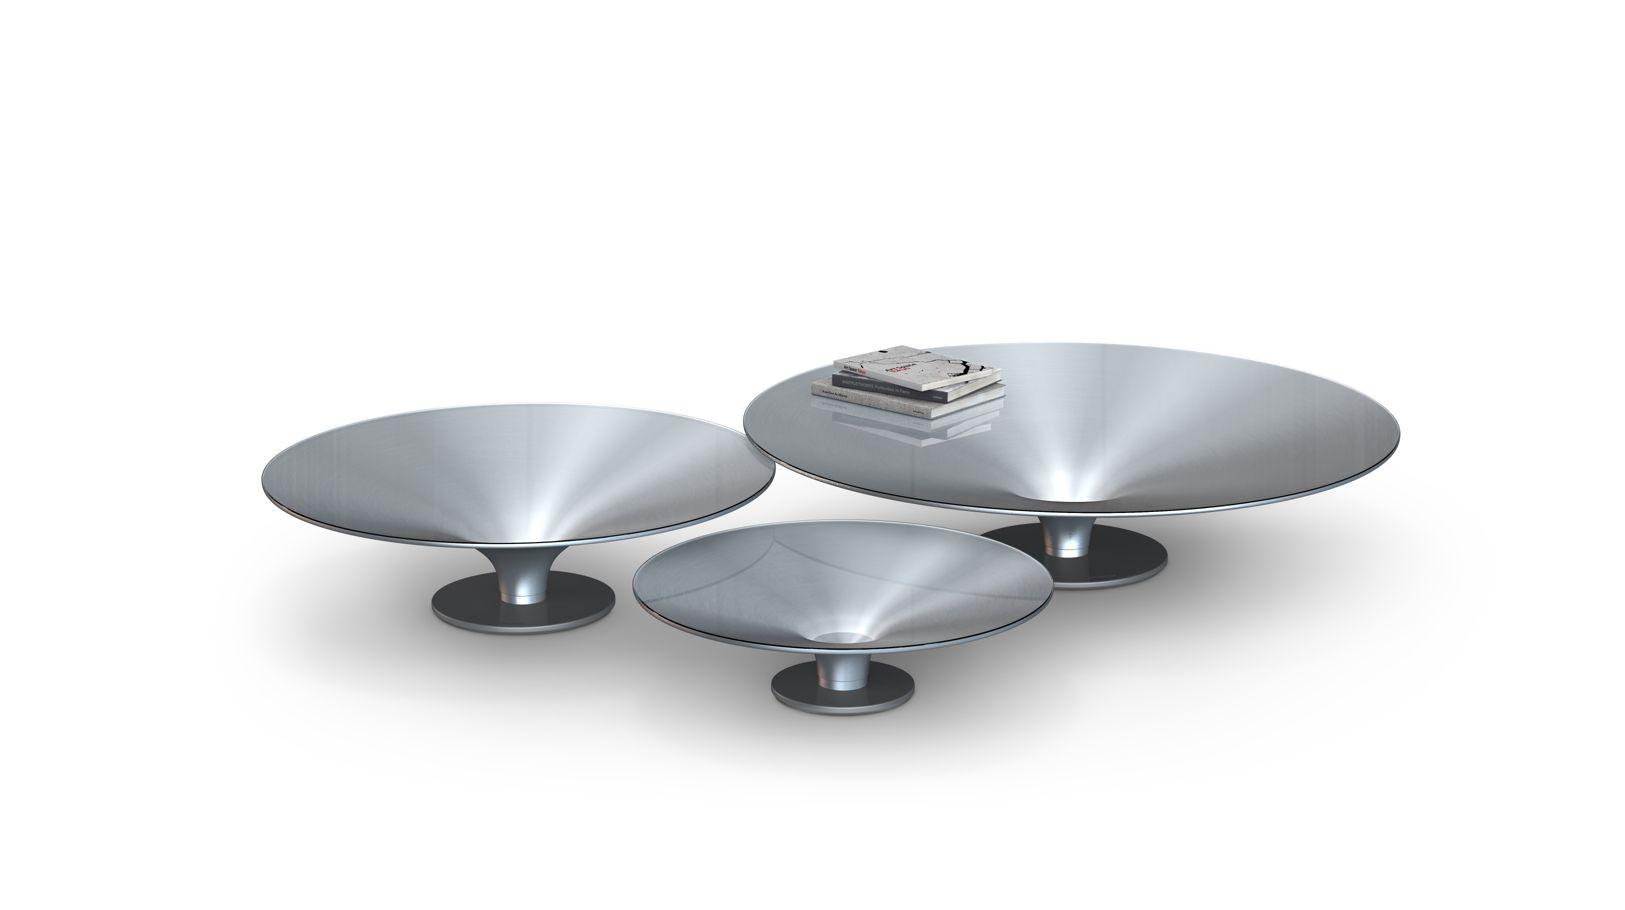 Ovni table basse tables basses roche bobois - Roche bobois tables basses ...